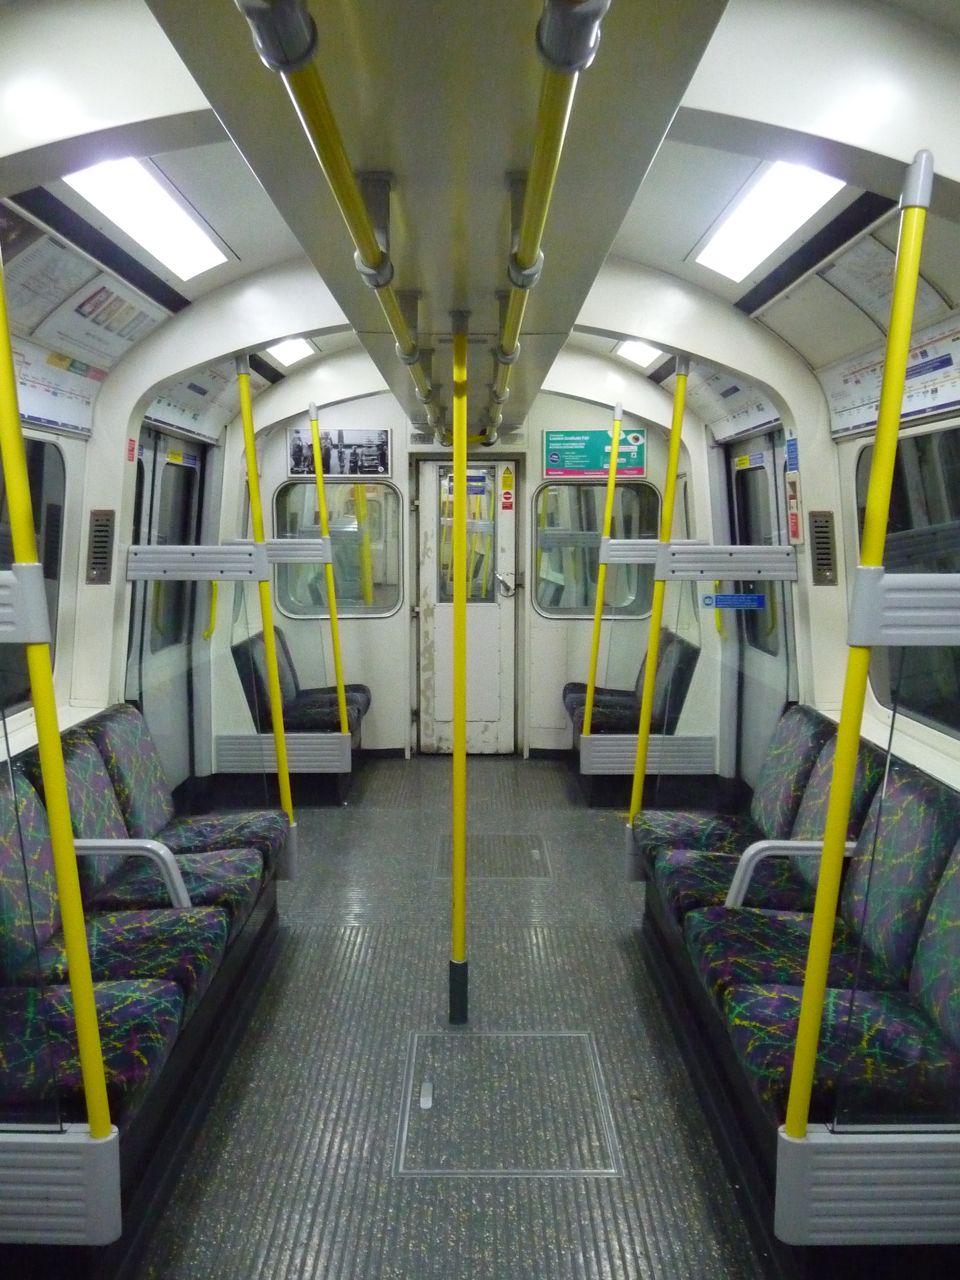 The London Transport Blues